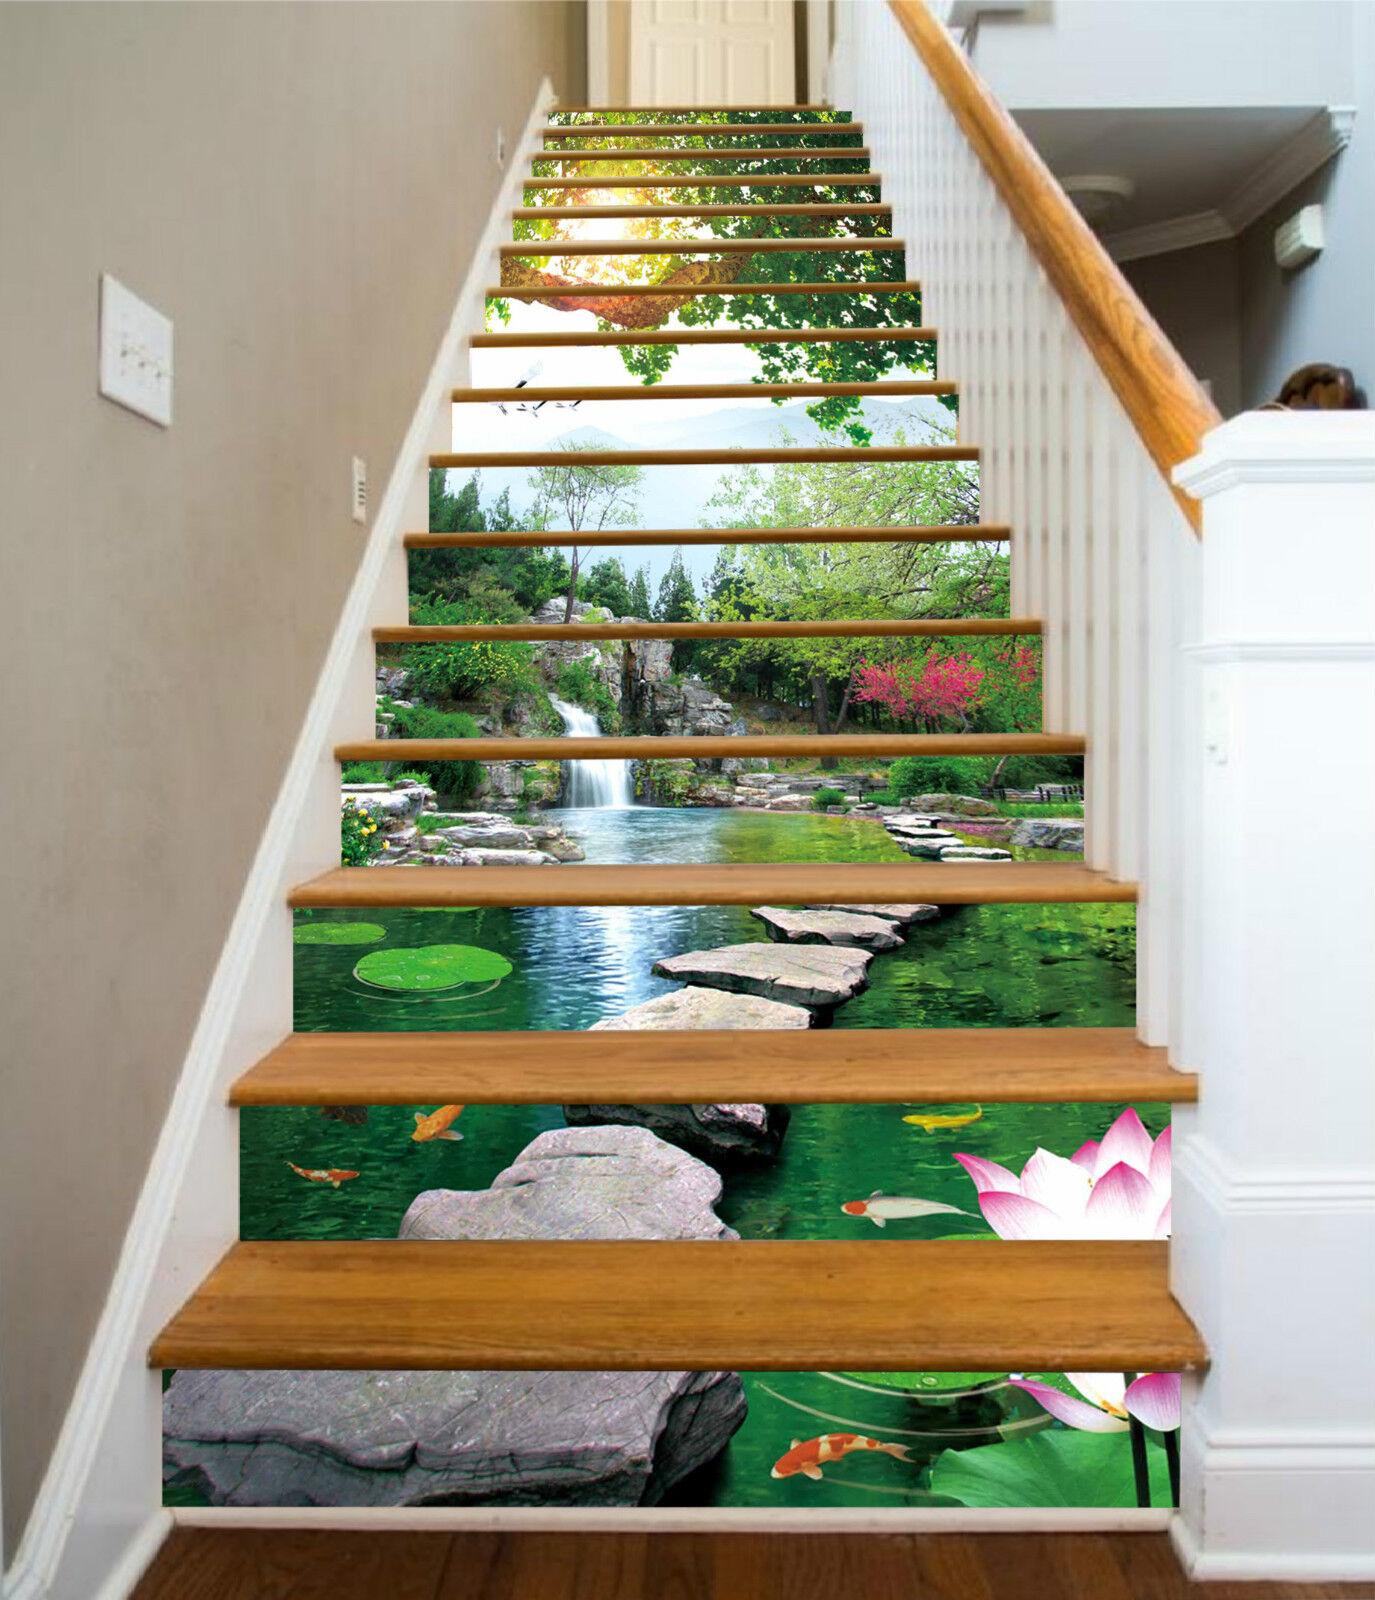 3D Schner See 048 Stair Risers Dekoration Fototapete Vinyl Aufkleber Tapete DE